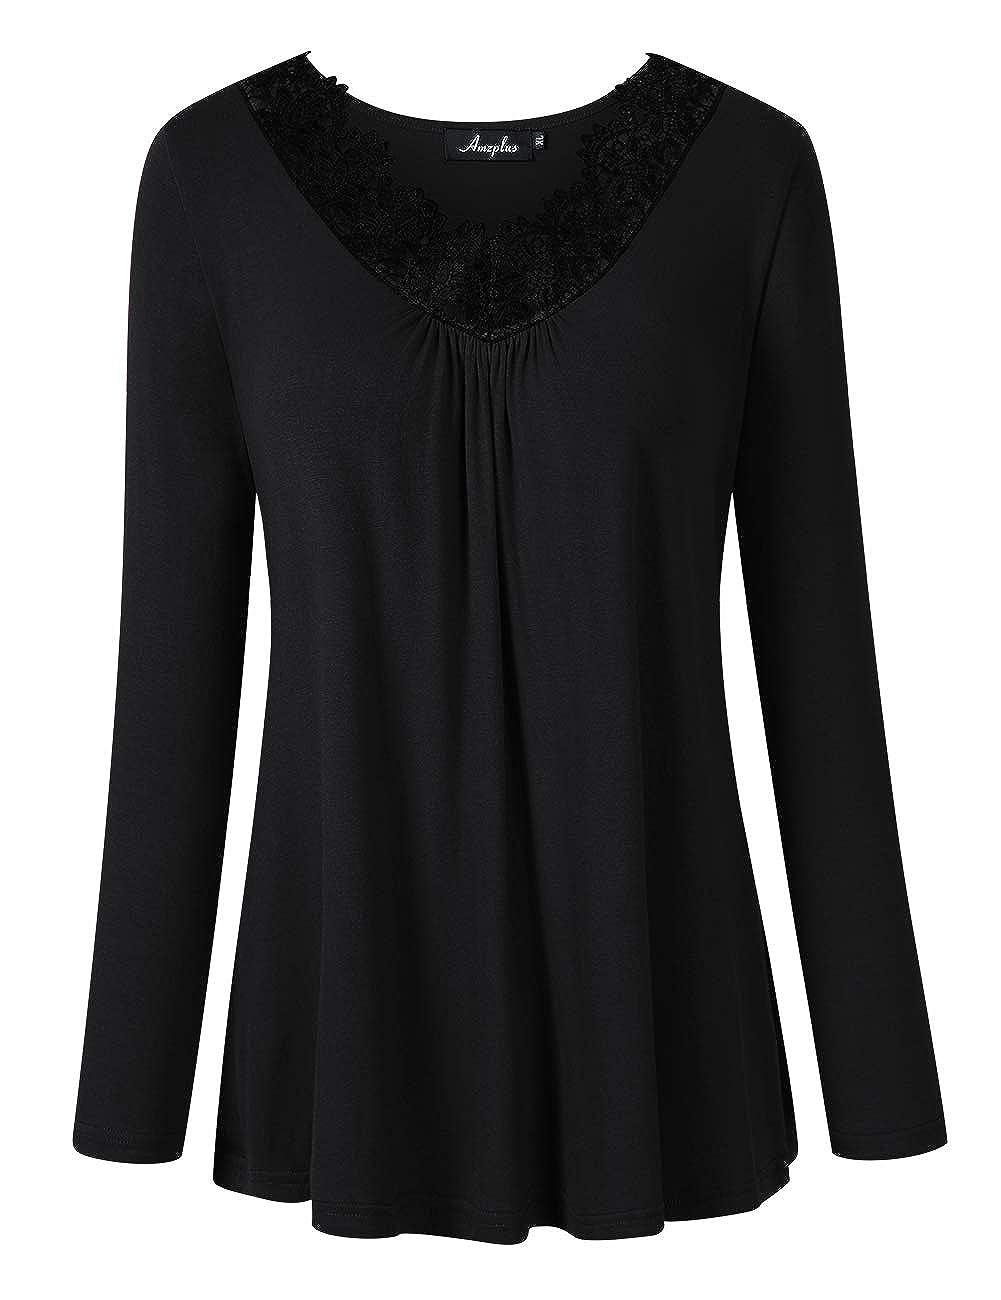 9ee04e446ad AMZ PLUS Women's Plus Size Long Sleeve Lace Stitching V Neck Blouse Tunic  Top at Amazon Women's Clothing store: